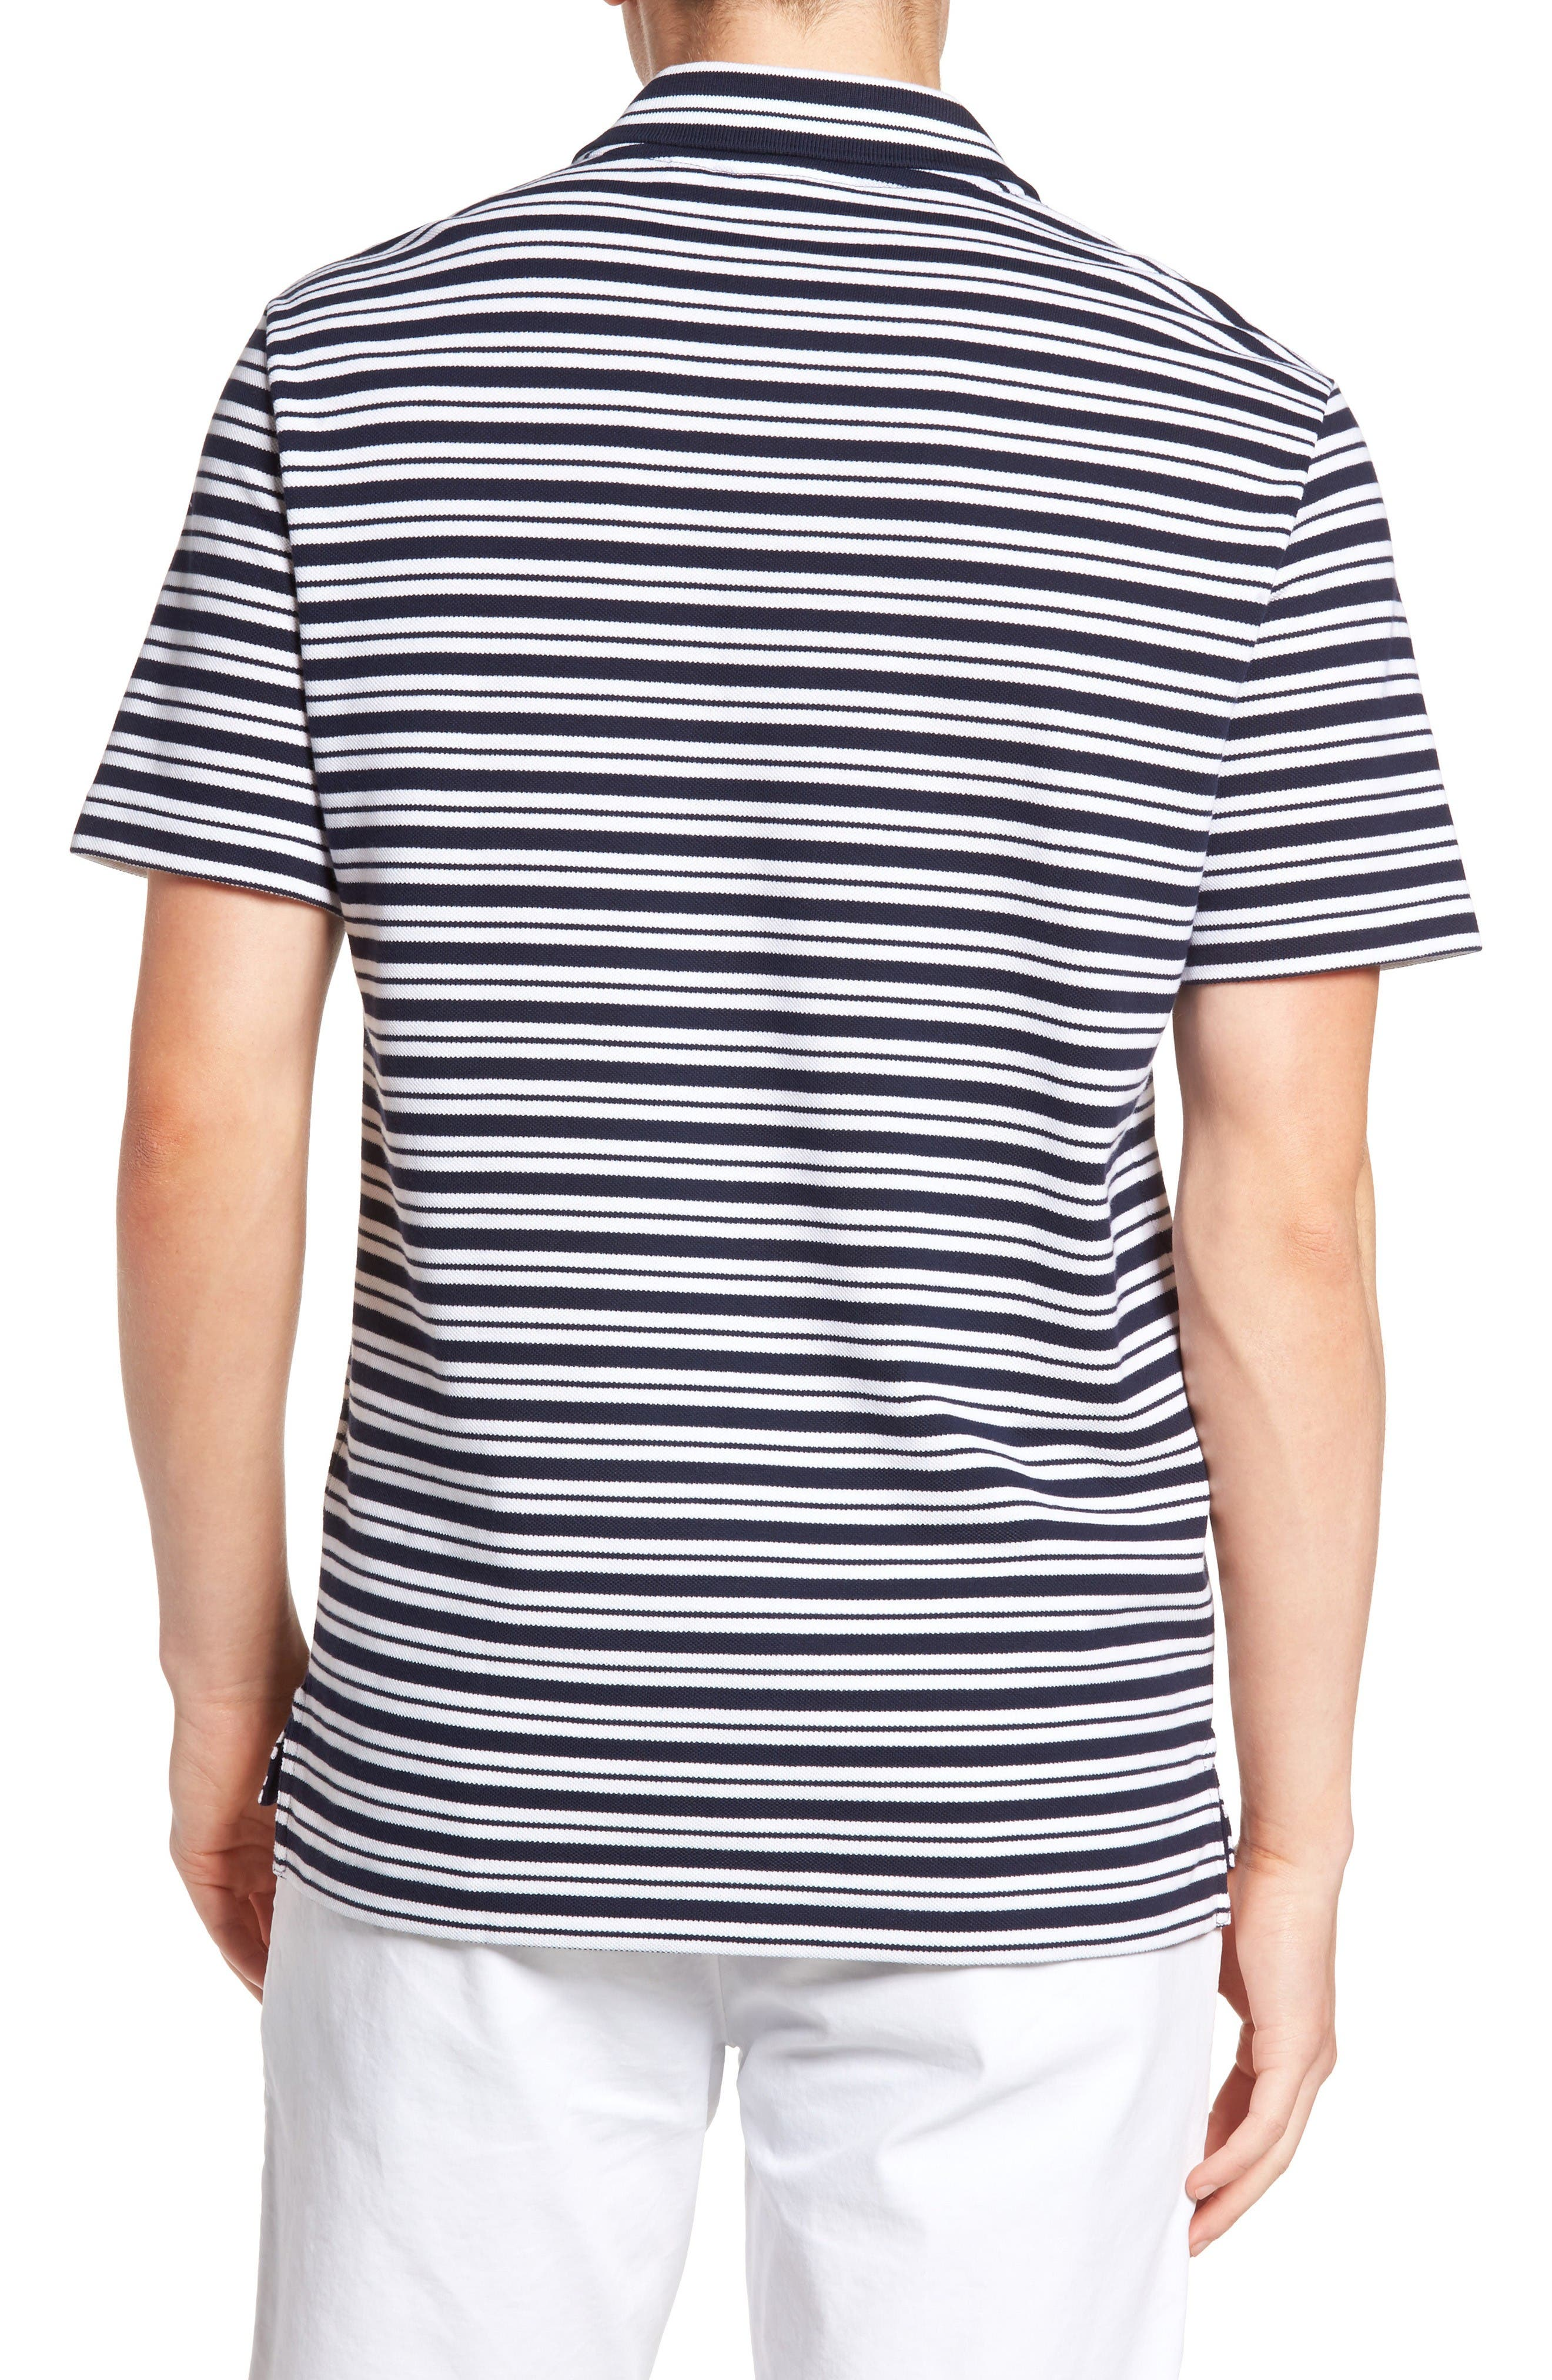 Alternate Image 2  - Lacoste Striped Polo